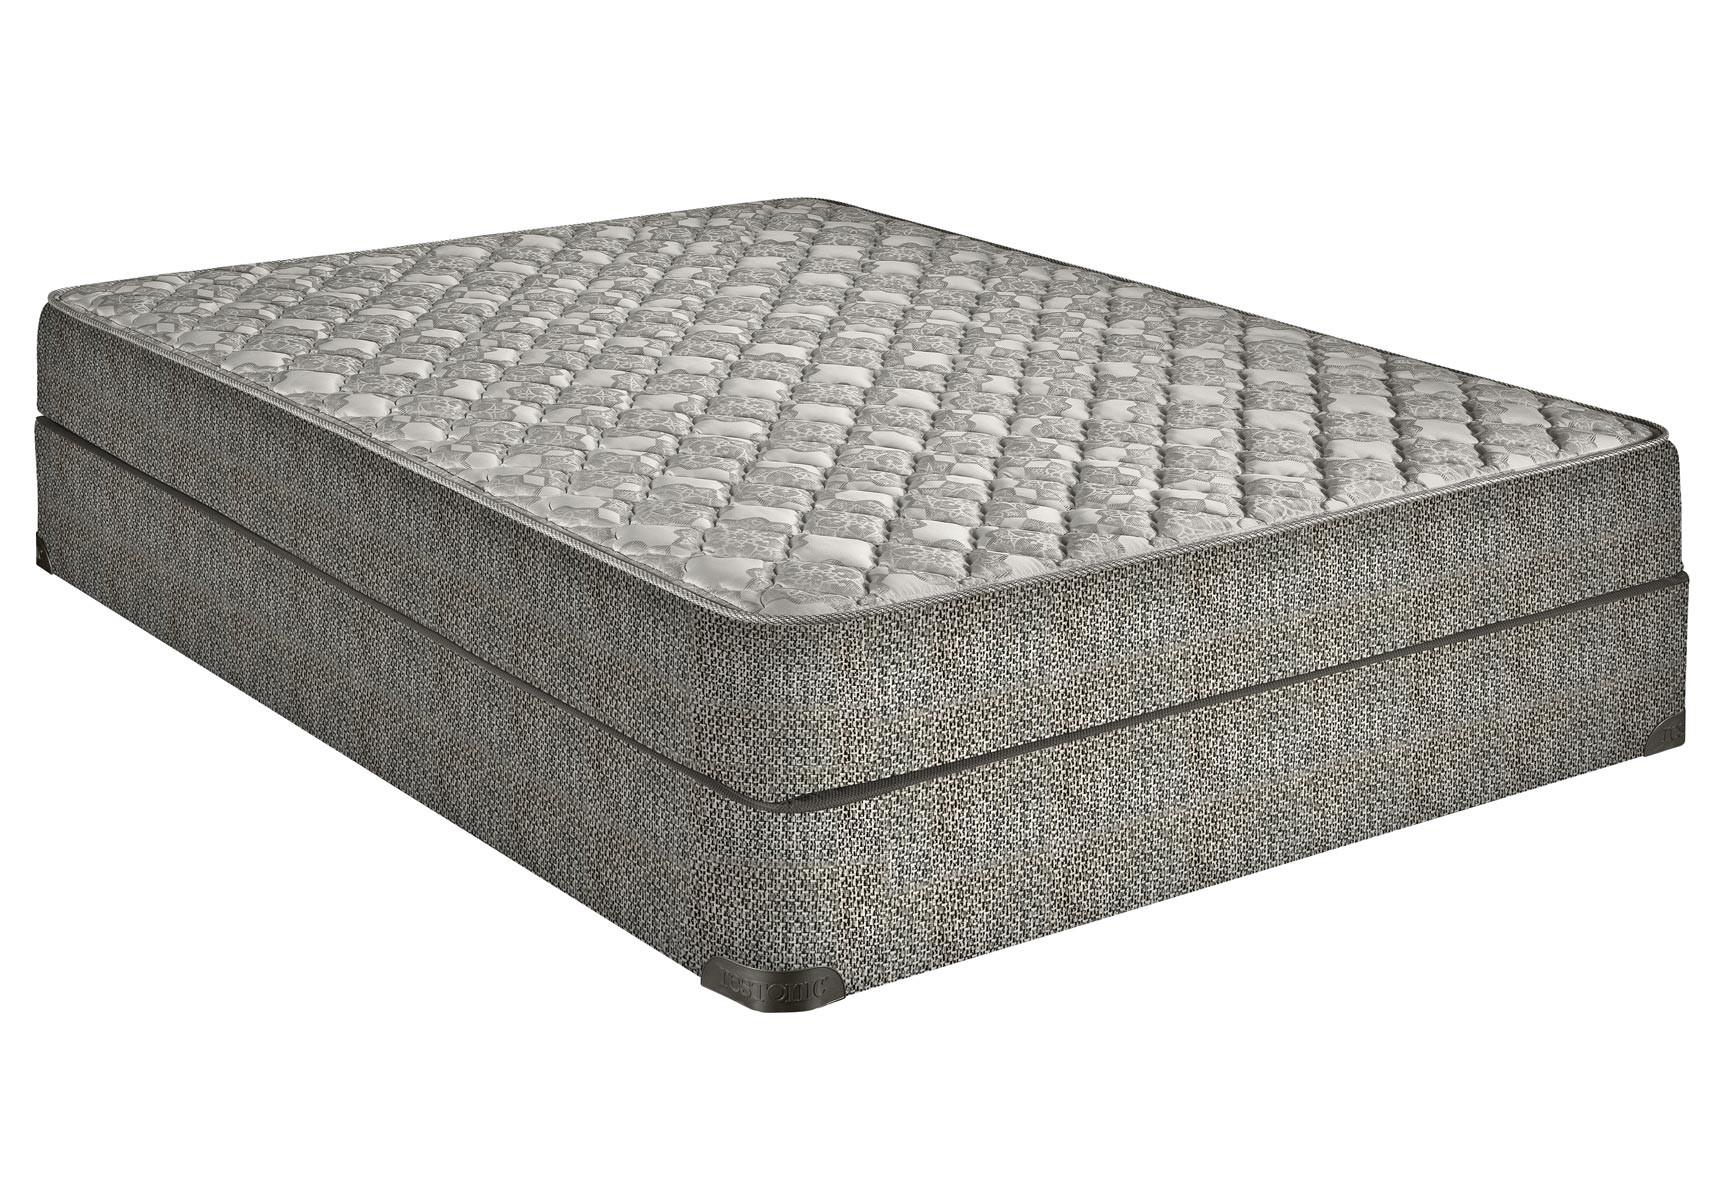 Inexpensive mattresses houston tx phoenix az primo cheap for American freight furniture and mattress phoenix az